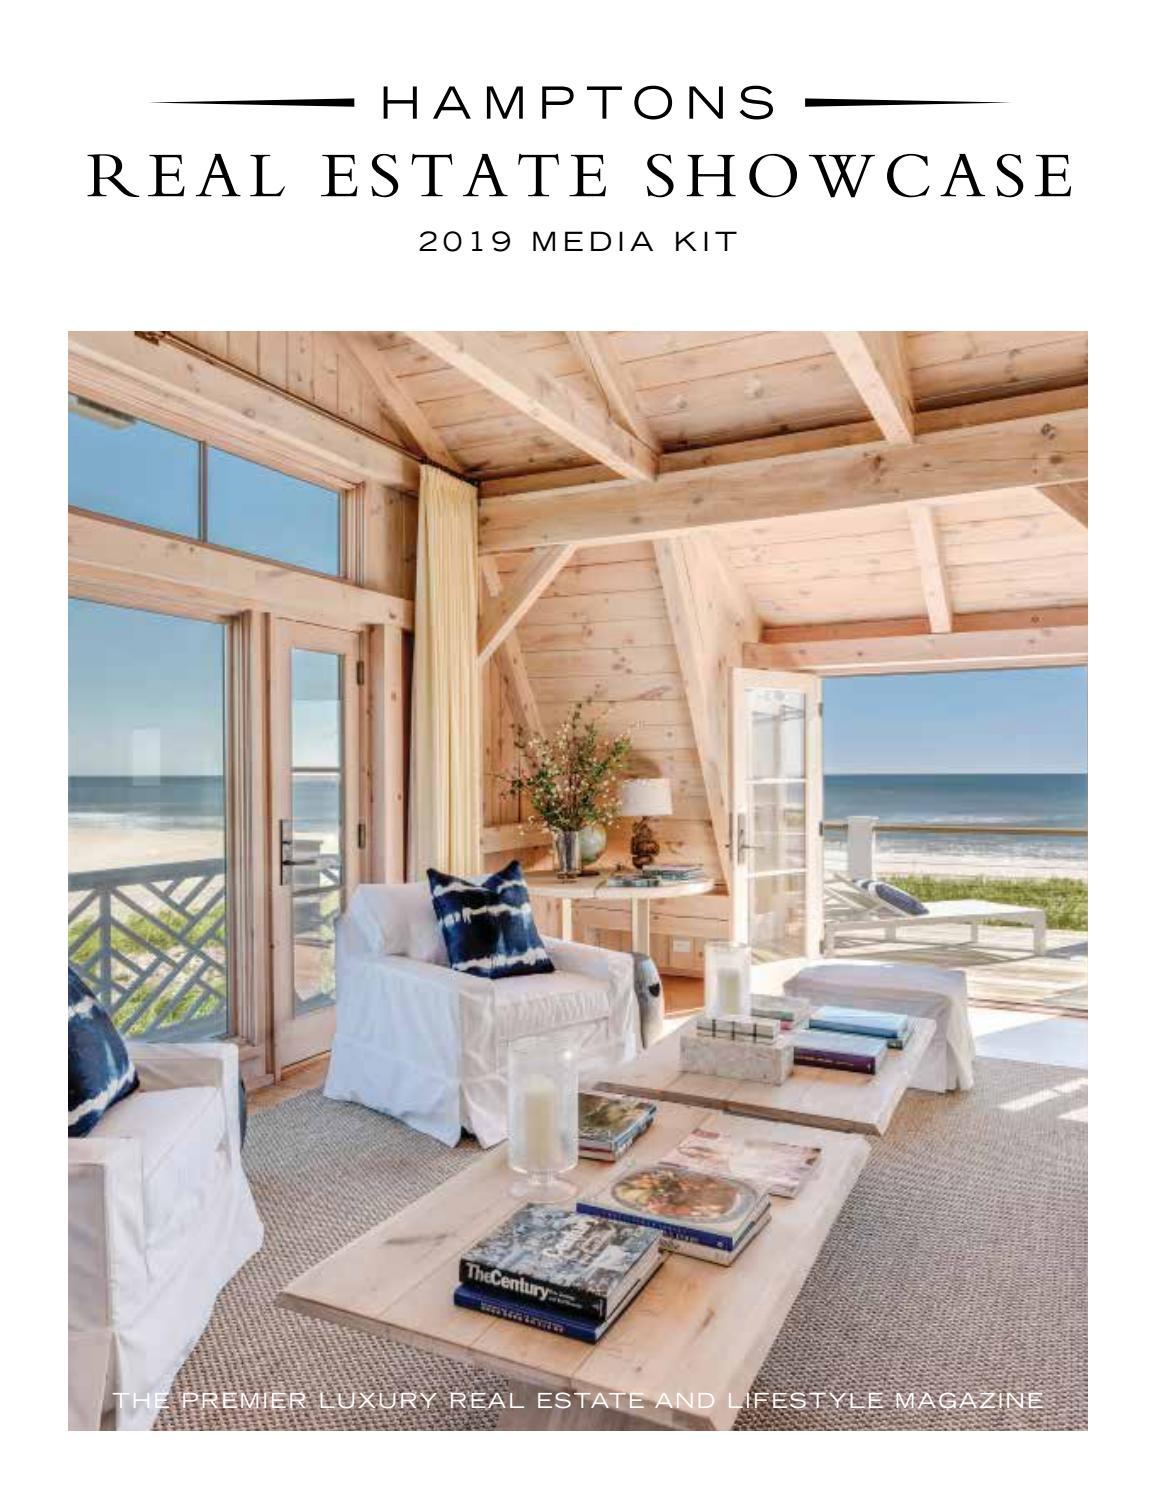 Hamptons Real Estate Showcase